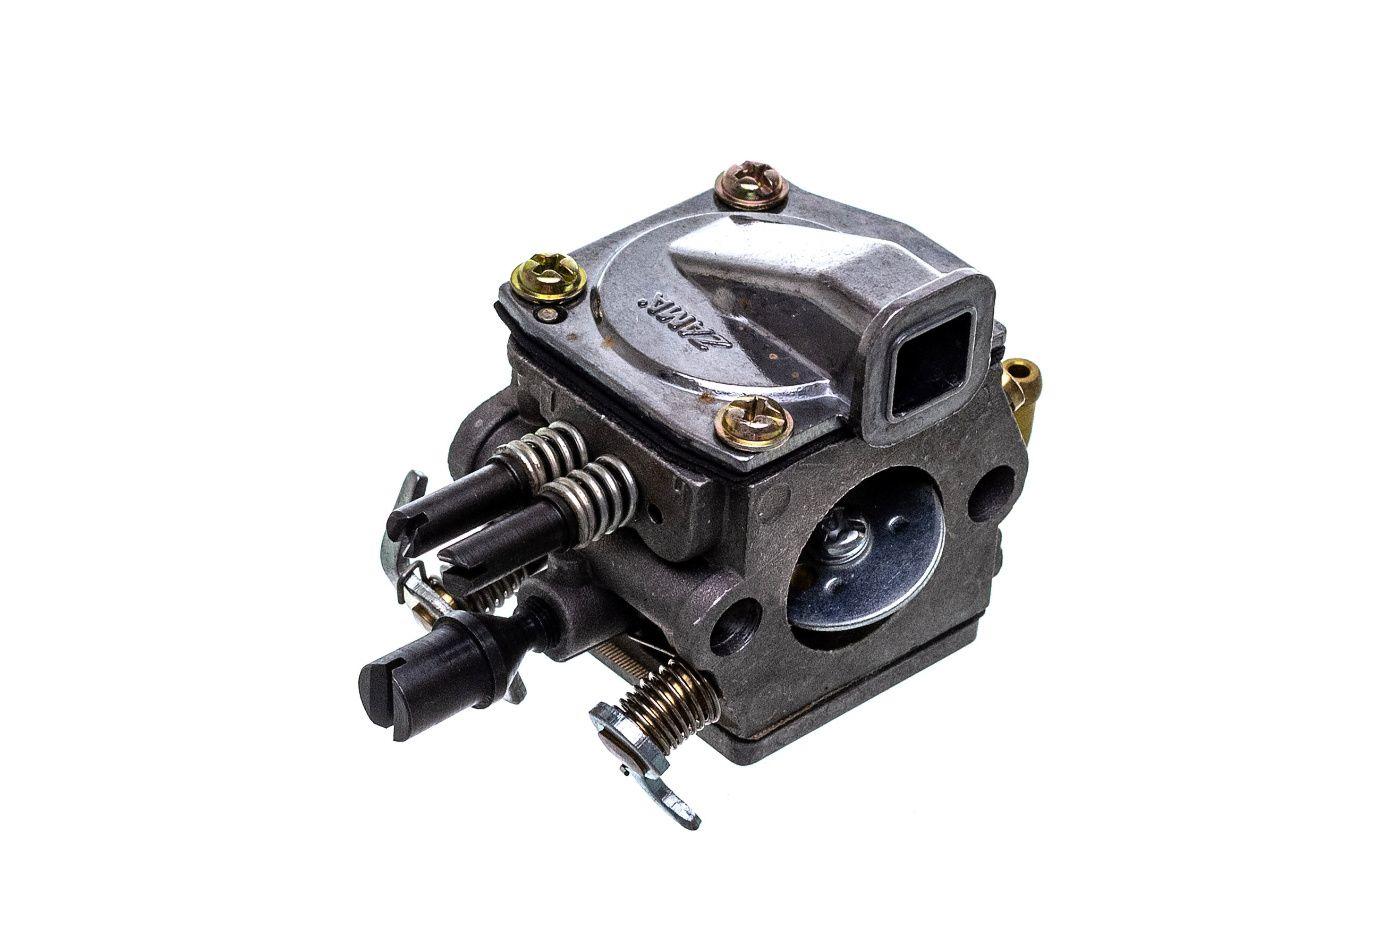 Karburátor Stihl MS340 MS360 034 036 C1Q-S152E (1125 120 0613)